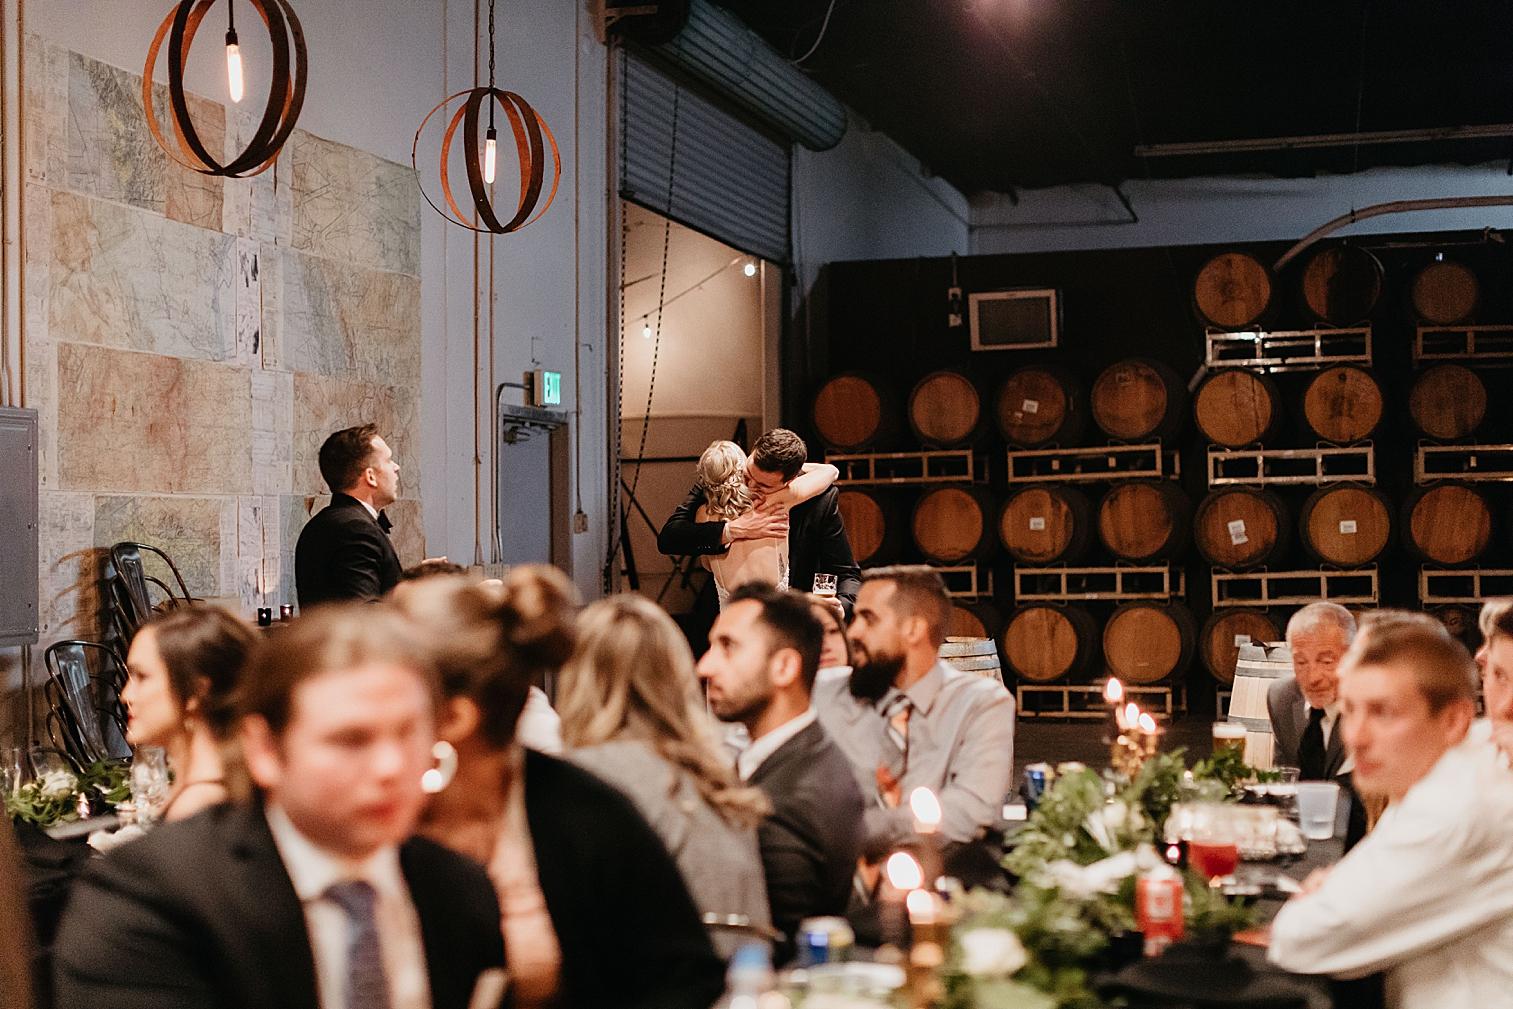 32-North-Brewery-Wedding-134.jpg